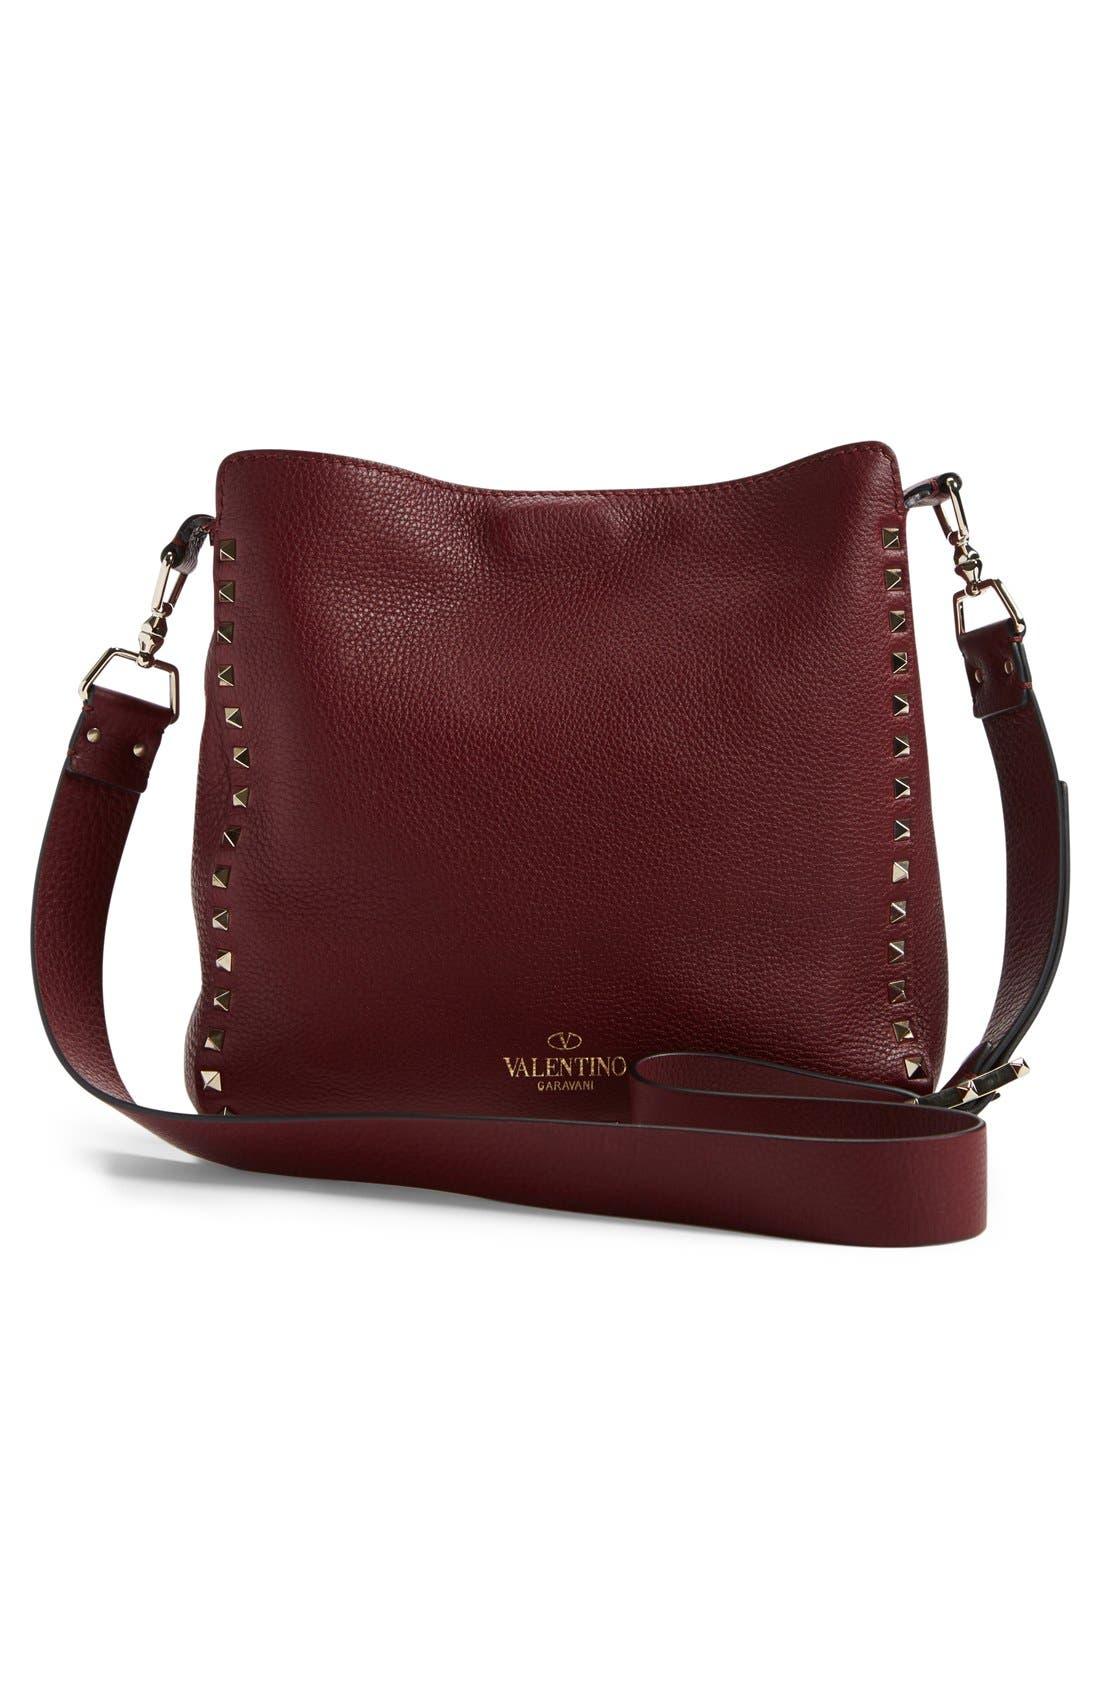 Alternate Image 2  - Valentino 'Small Rockstud' Leather Hobo Bag